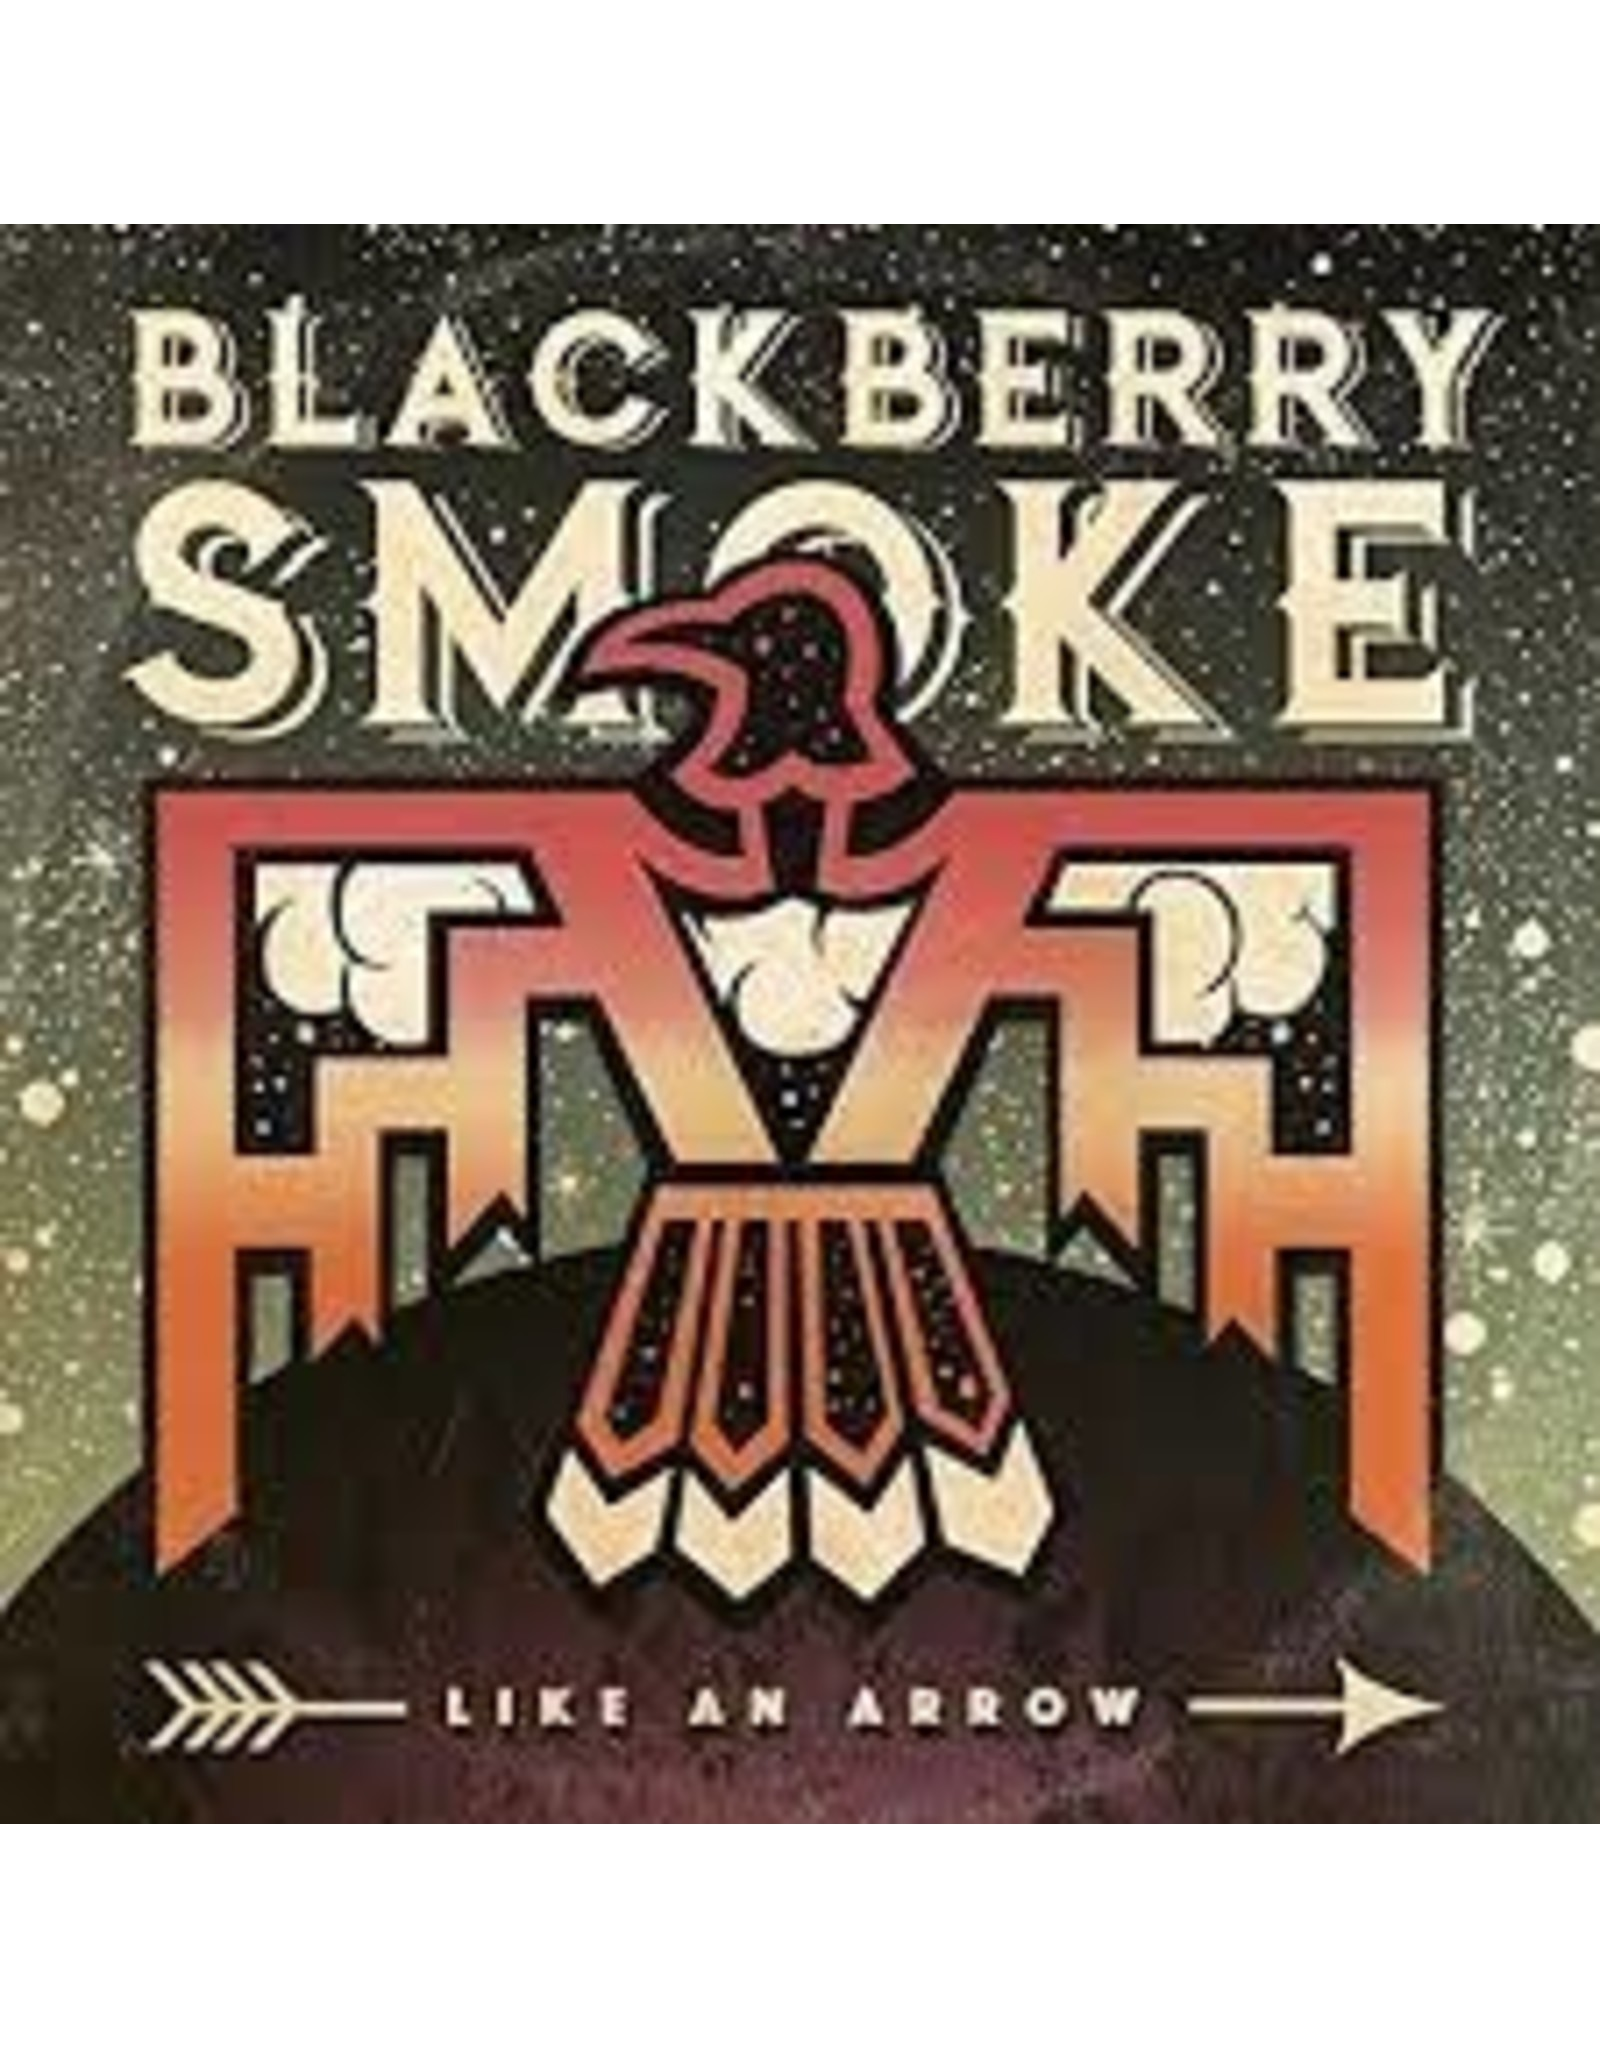 Blackberry Smoke  - Like An Arrow CD